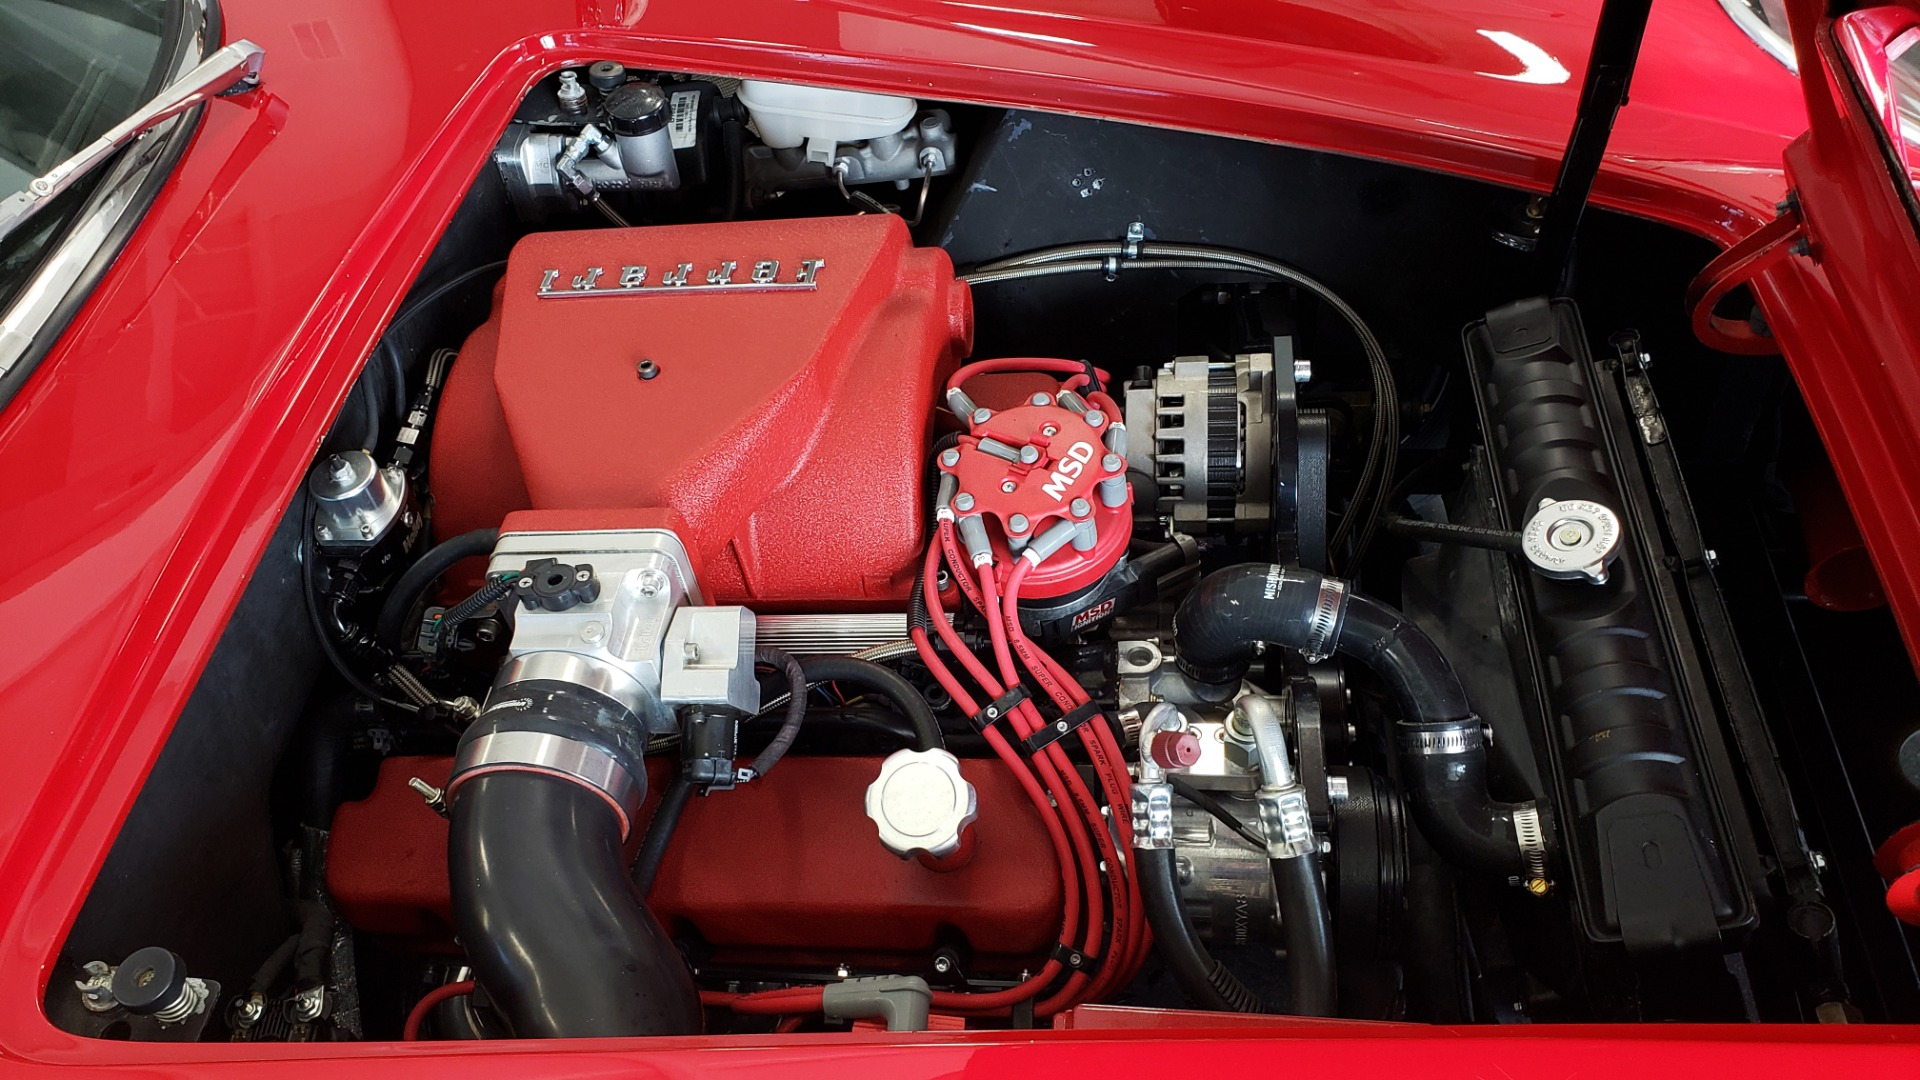 Used 1961 Ferrari 250GT SWB CALIFORNIA REPLICA / 302CI V8 / TREMEC 5-SPEED for sale Sold at Formula Imports in Charlotte NC 28227 65